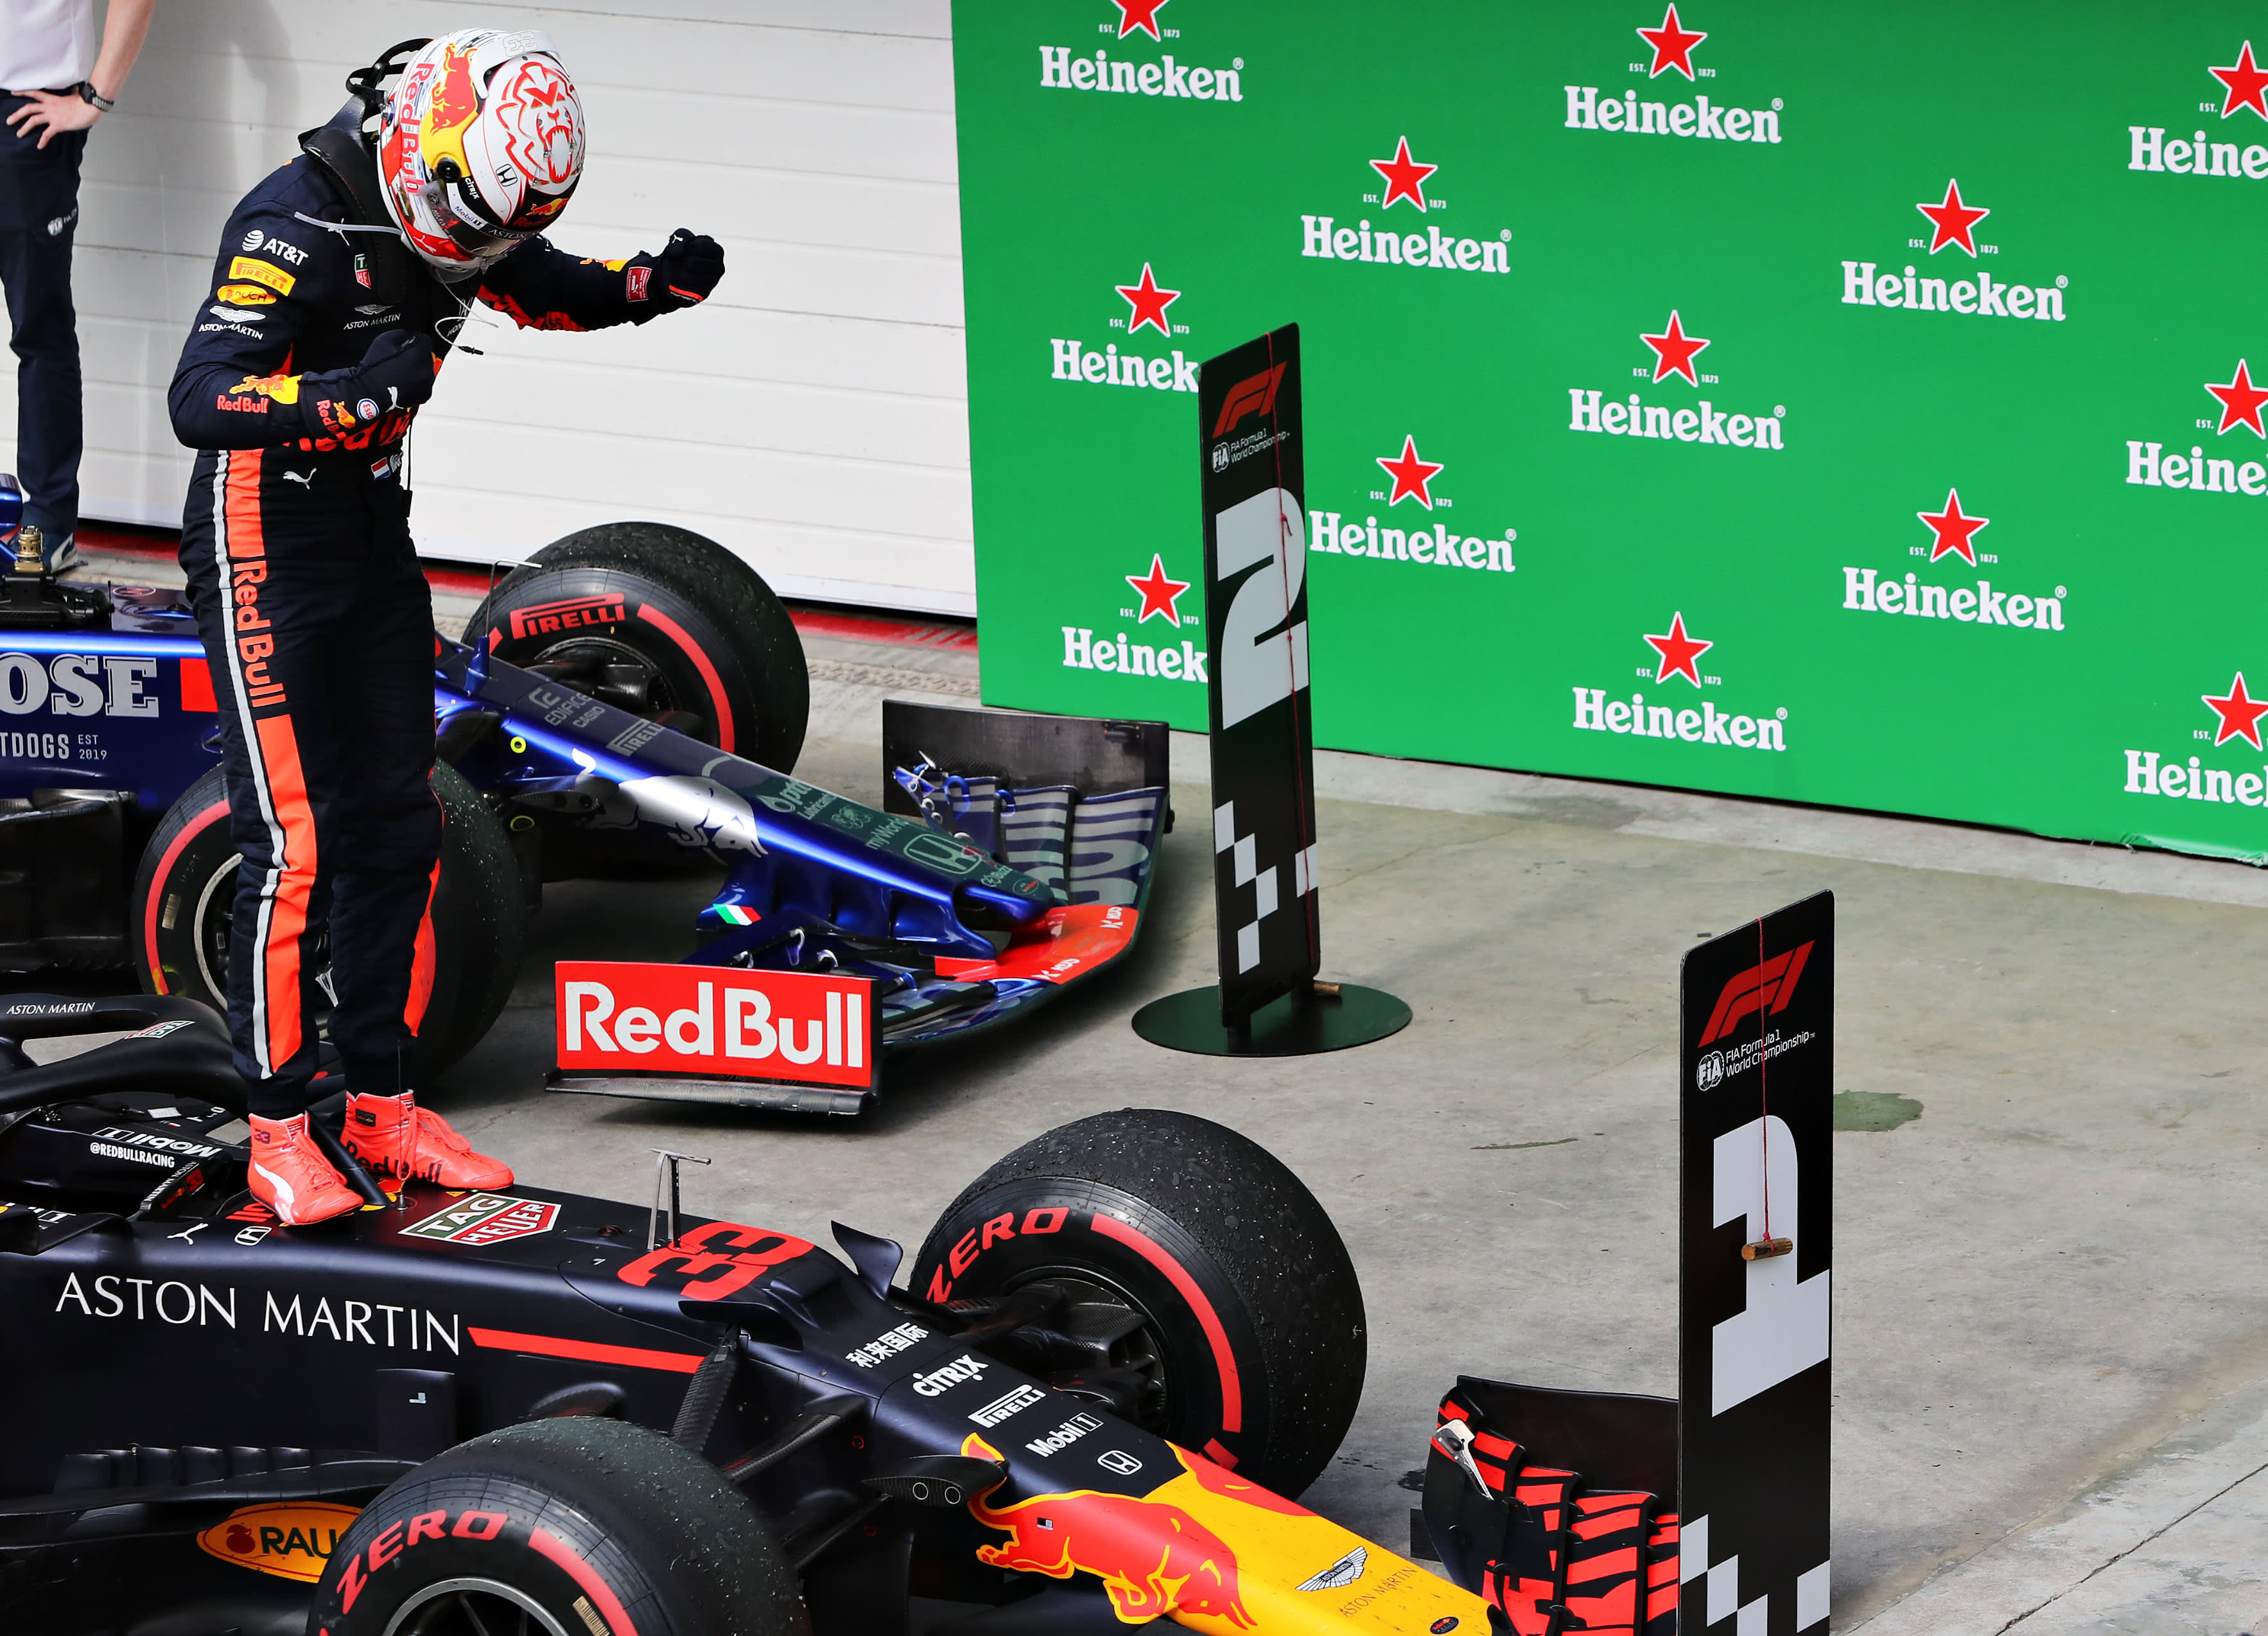 Max Verstappen, Brasilia 2019